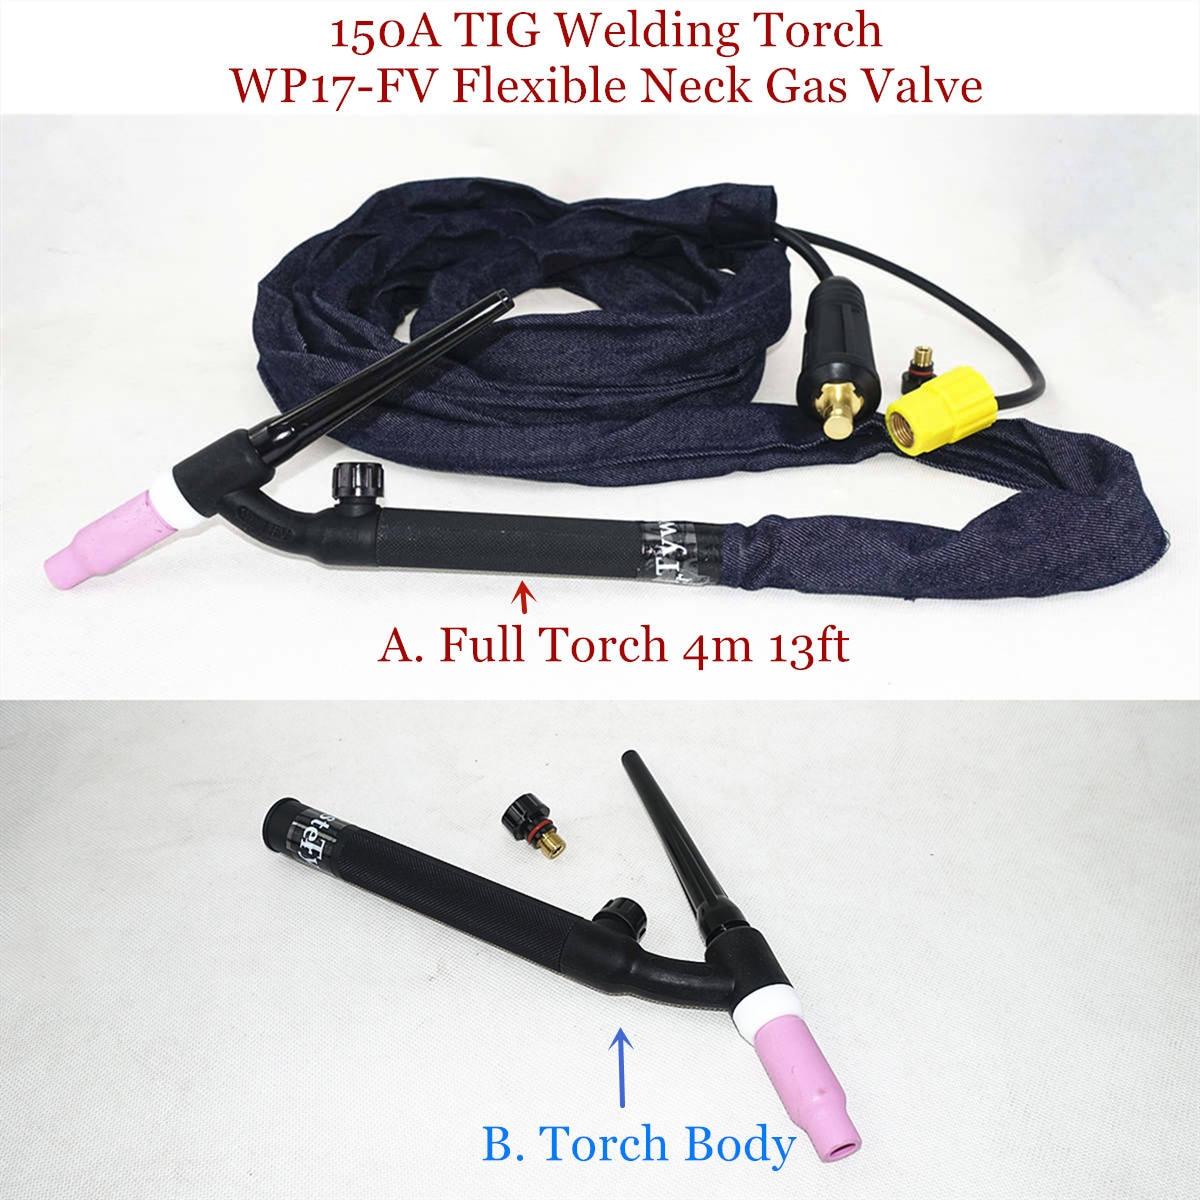 150A TIG Welding Torch WP17-FV Flexible Neck Gas Valve GTAW Gas Tungsten Arc Welding Gun Argon Air Cooled WP17 TIG Torch